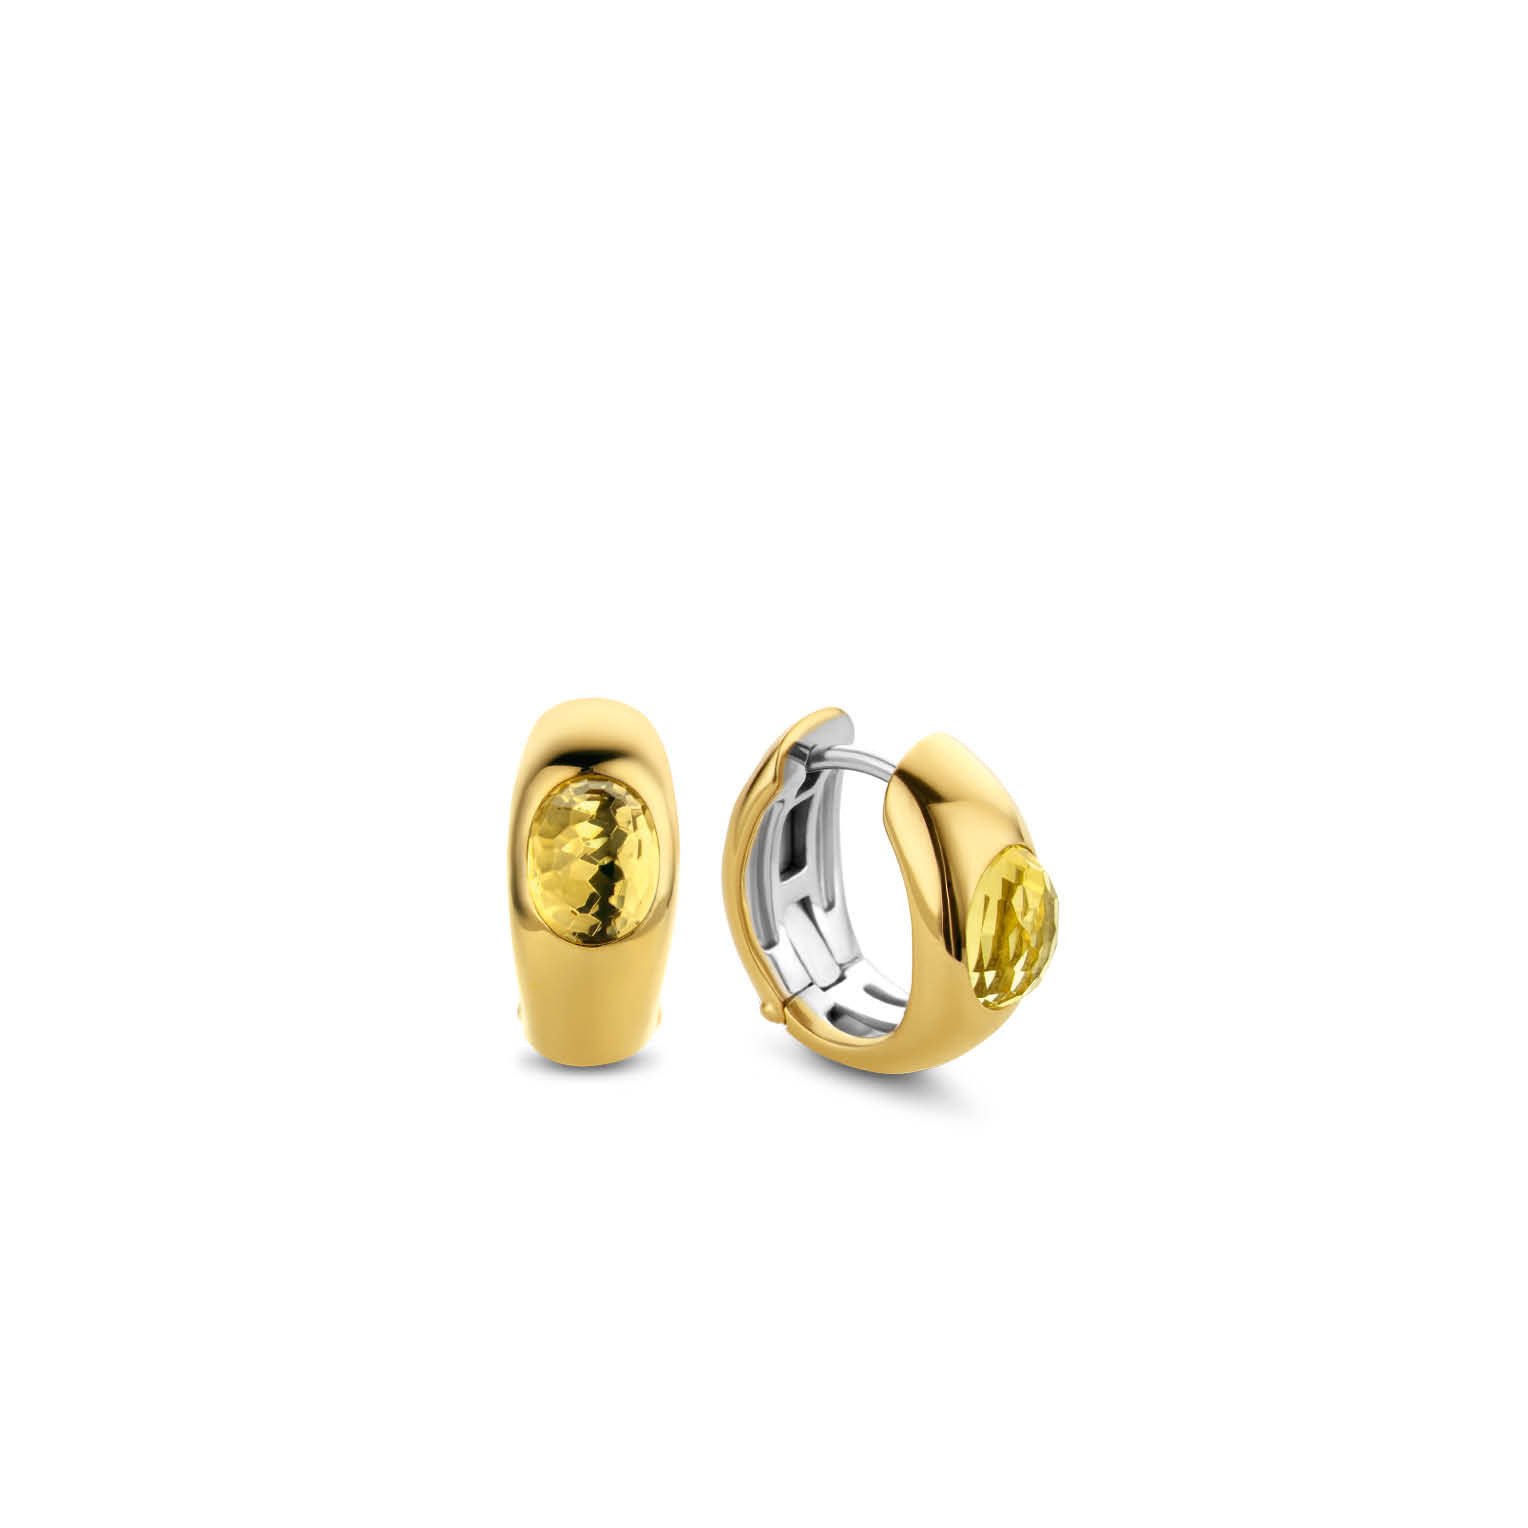 TI SENTO - Milano Earrings 7805TY-3